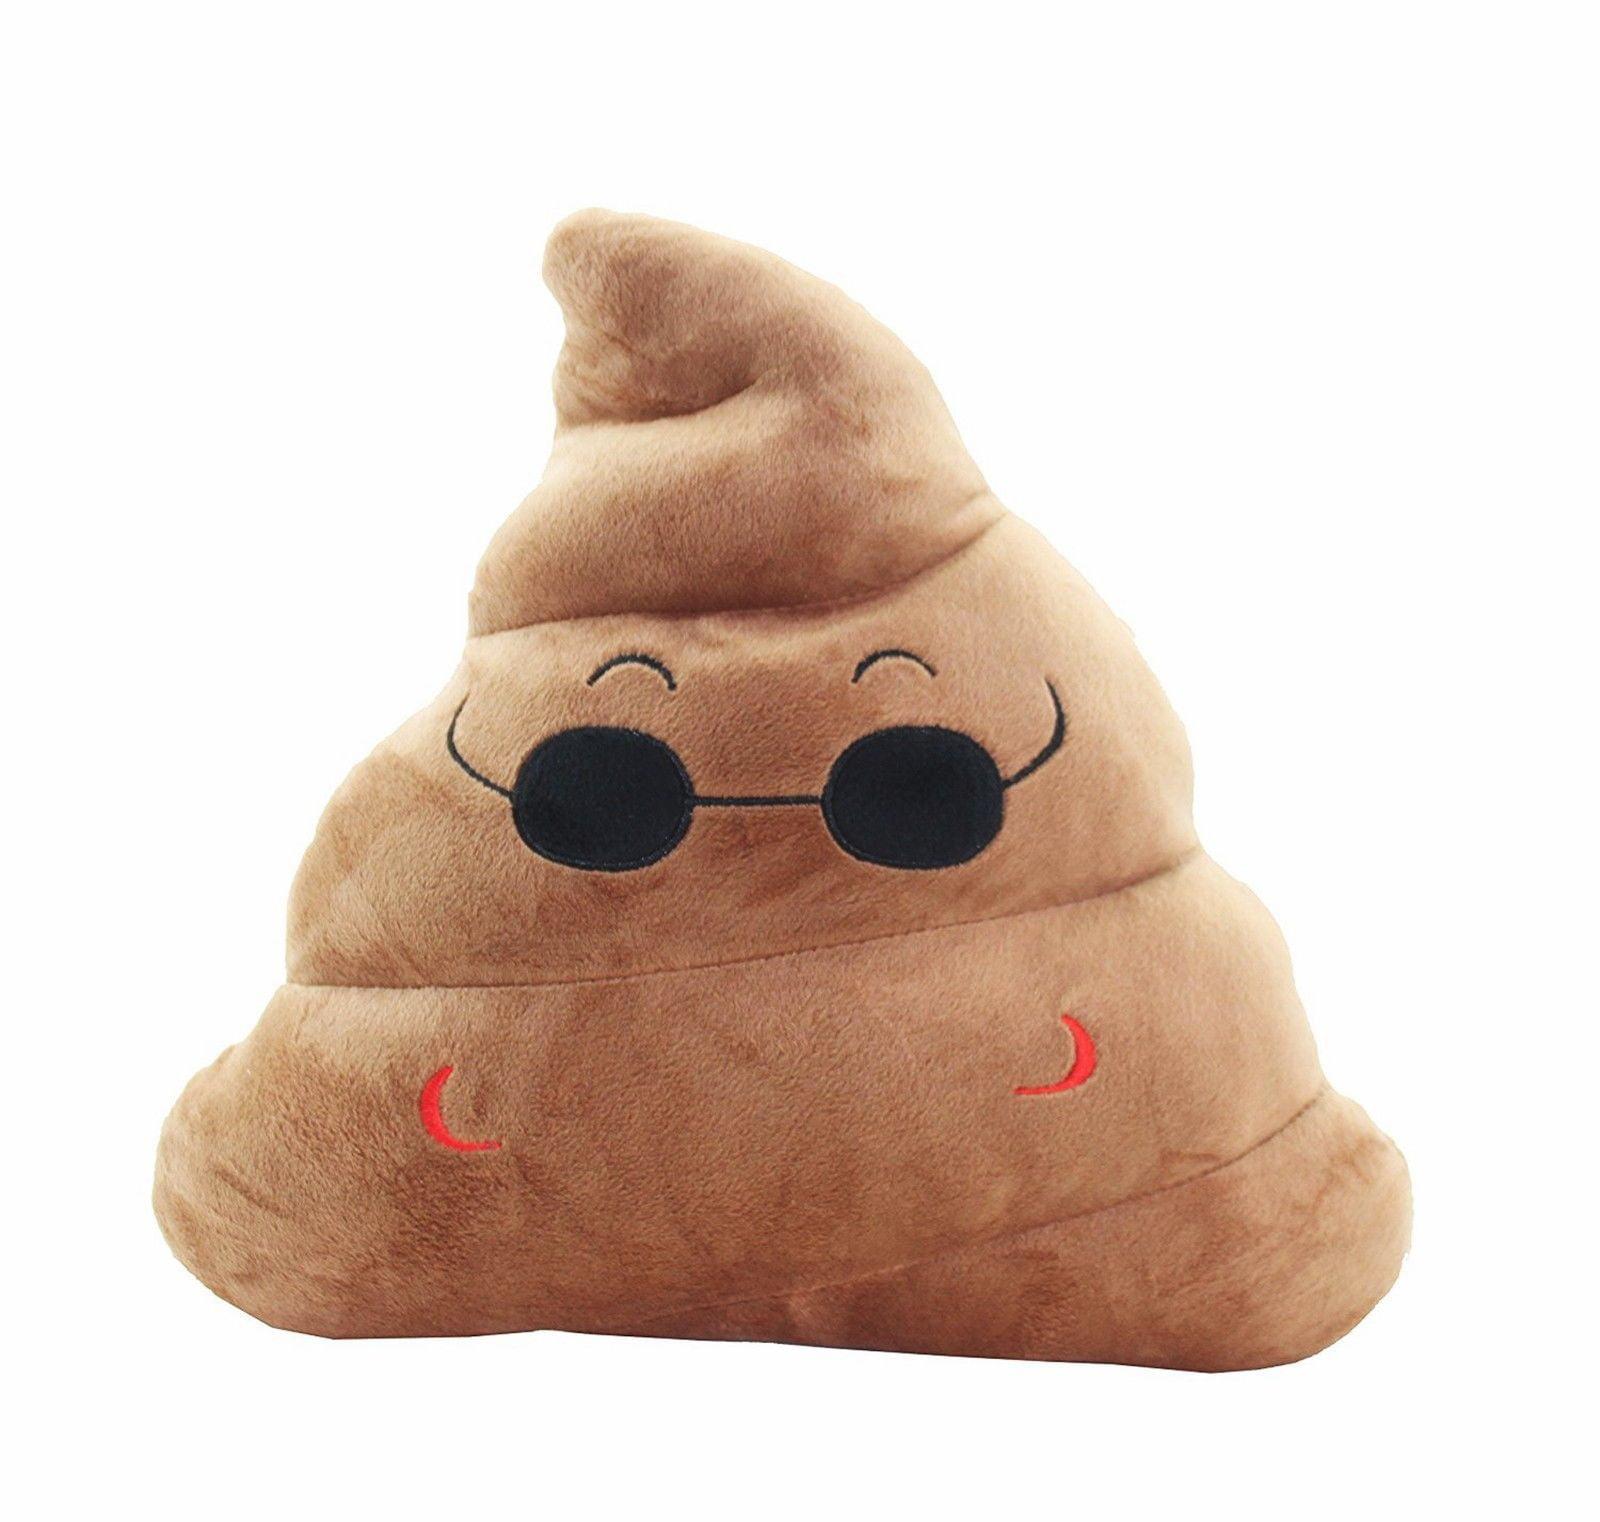 Emoji Sunglasses Poop Cushion Pillow Stuffed Plush Toy Pad Home